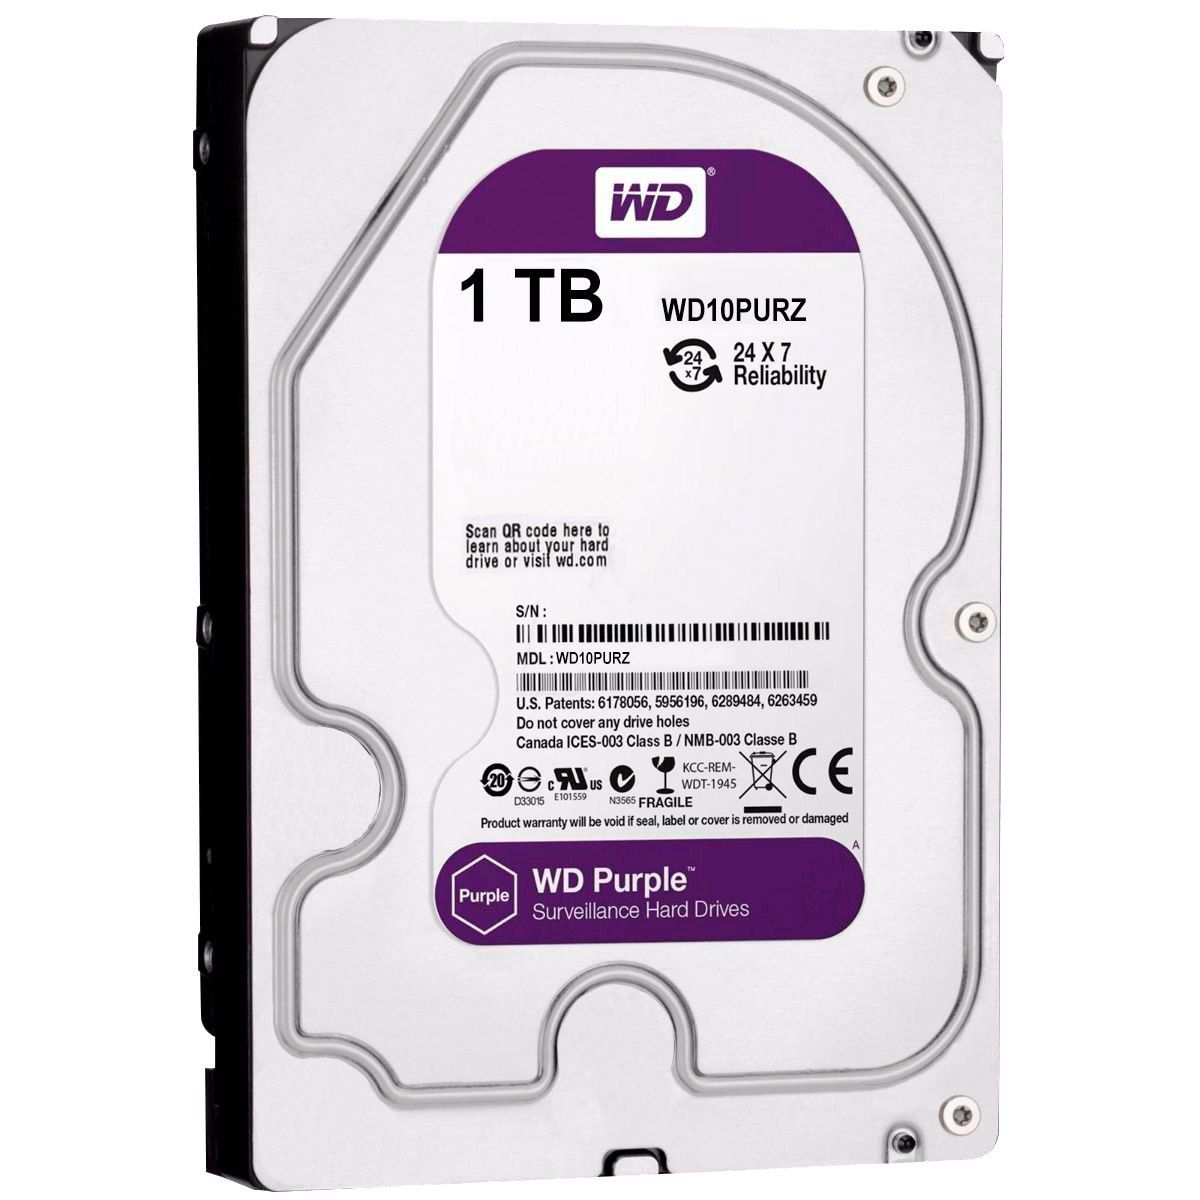 Kit 6 Câmeras de Segurança Full HD 1080p VHD 3230B G4 + DVR Intelbras Full HD + HD WD Purple 1TB + Acessórios  - Tudo Forte